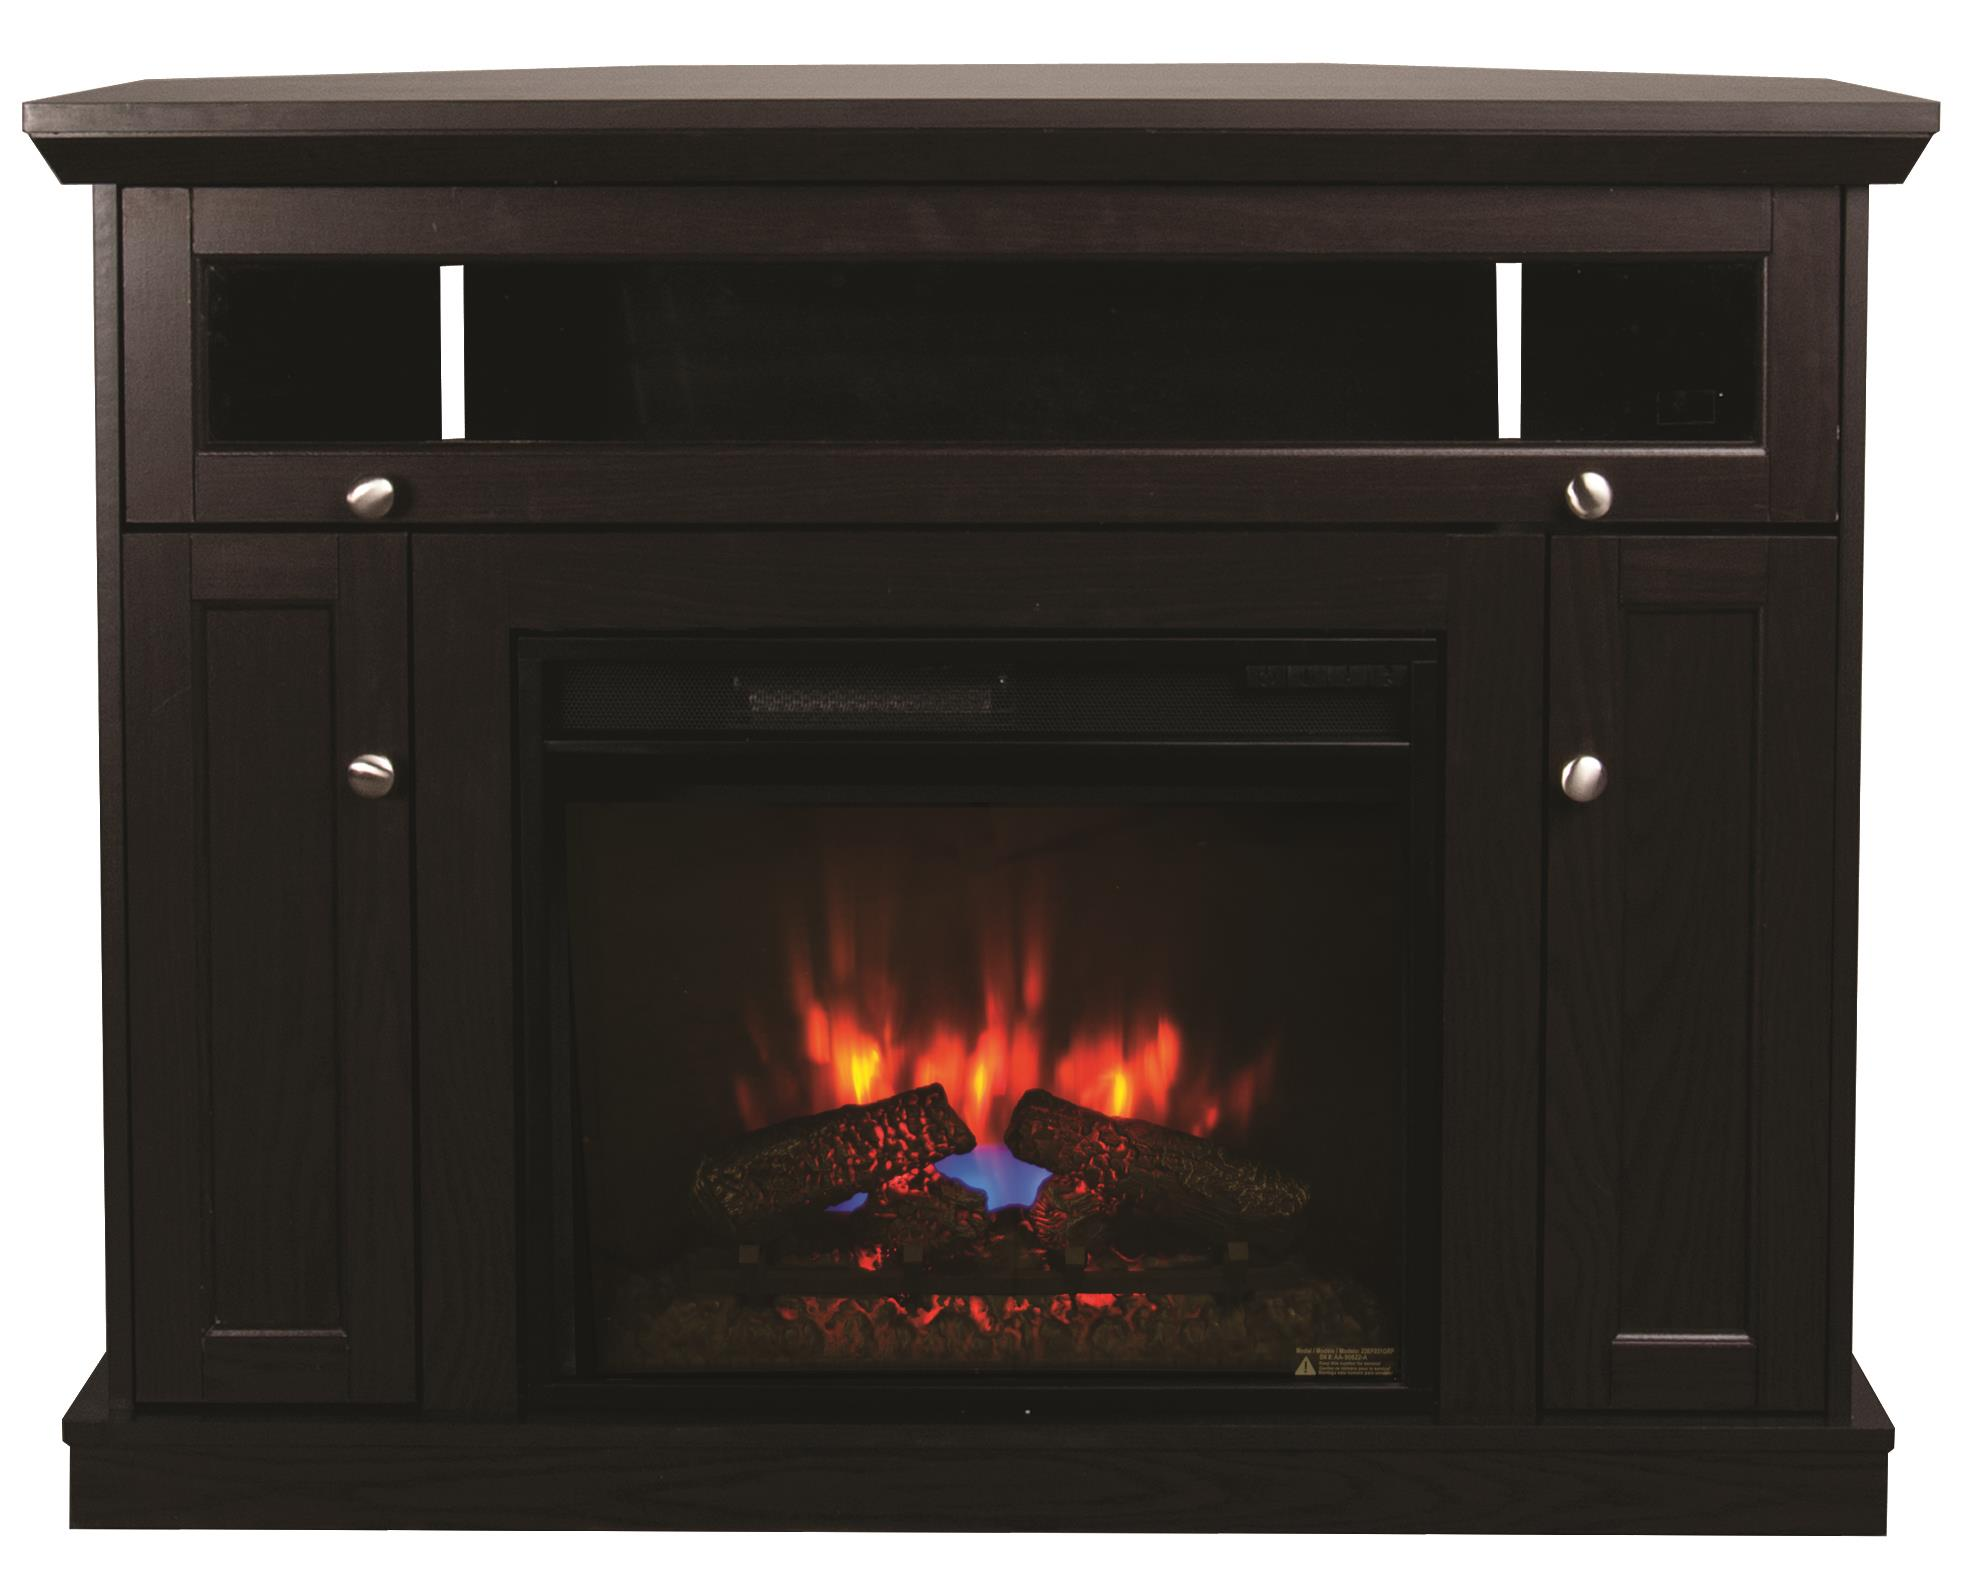 Morris Home Windsor Dacula 2 Piece Fireplace with Insert - Item Number: 23DE9047-PE91/23EF031GRP